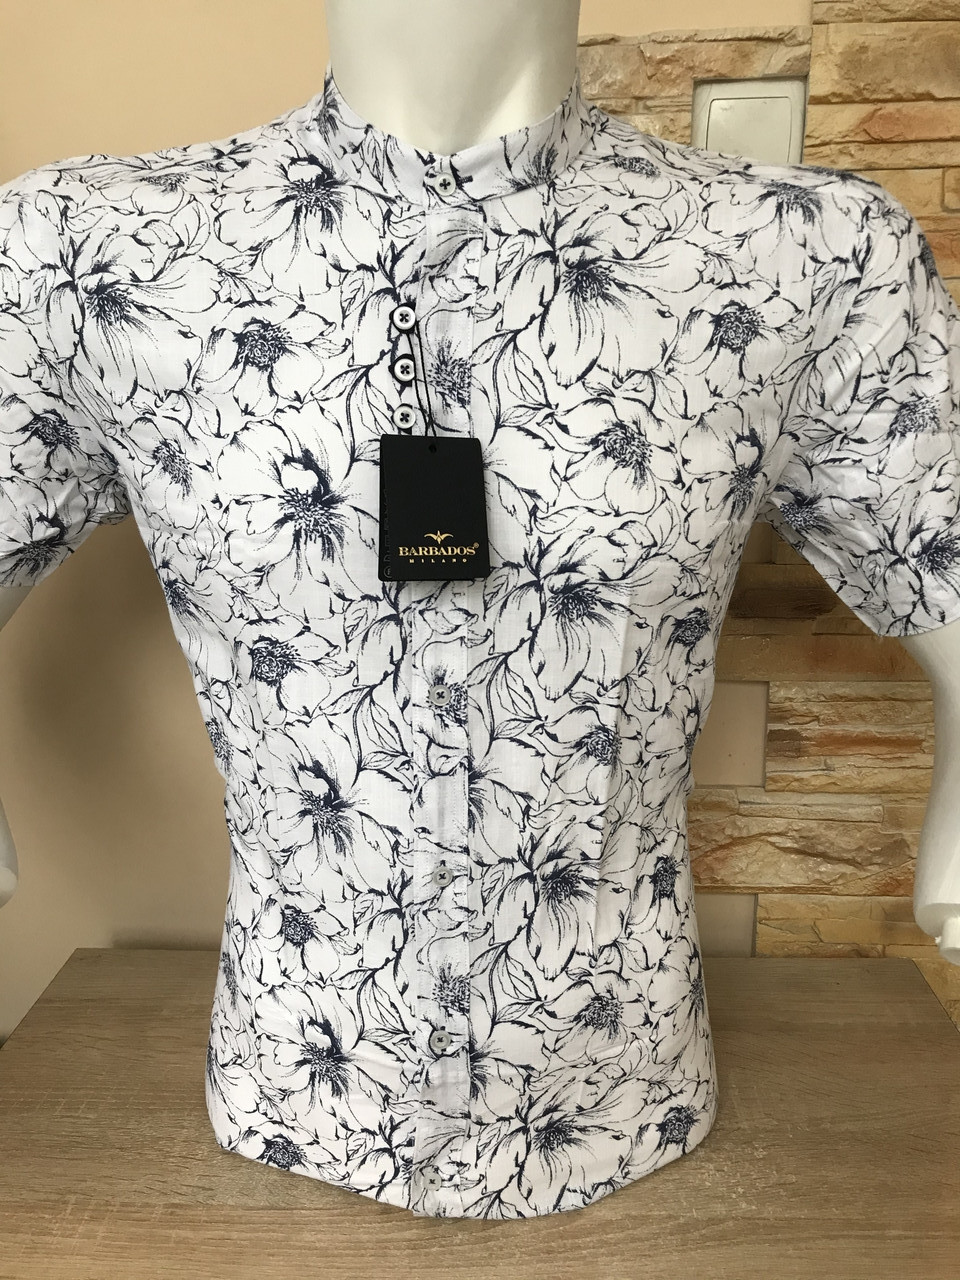 Рубашка с коротким рукавом Barbados лён,  стойка/принт